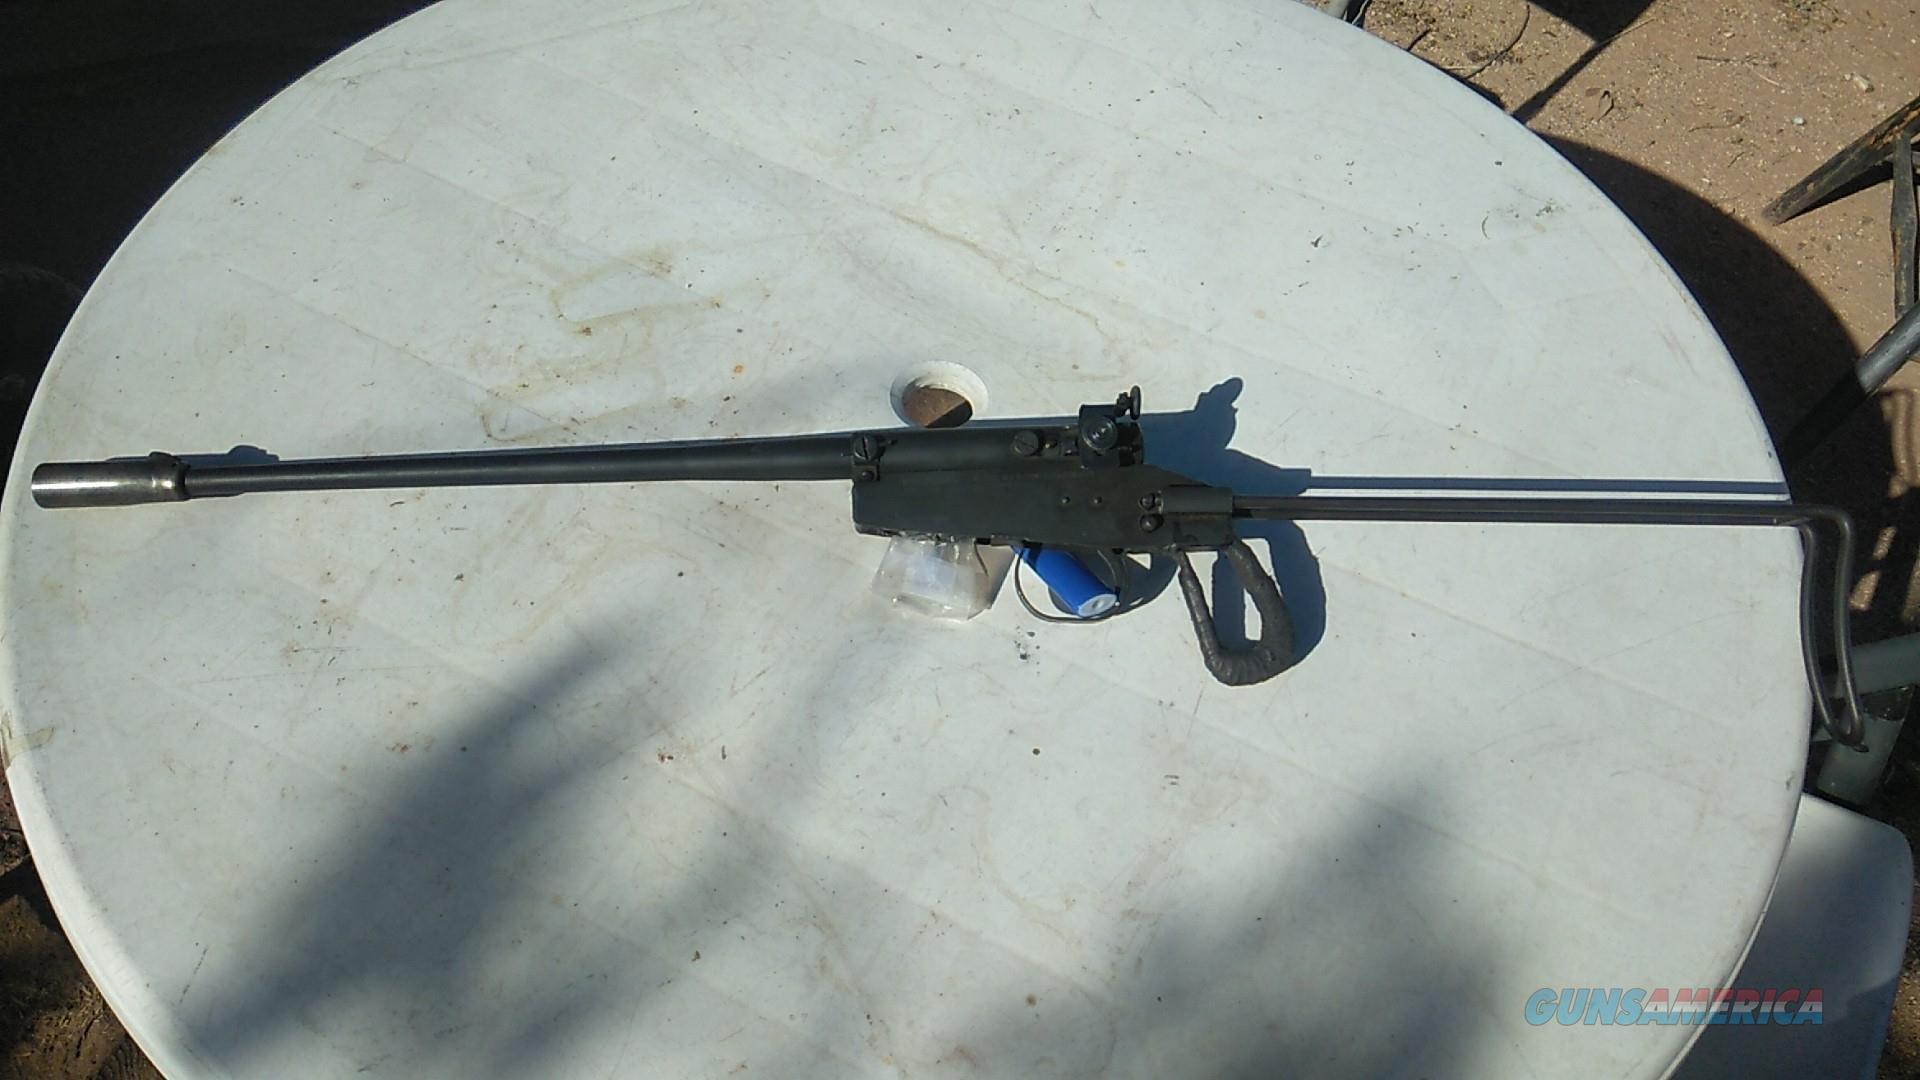 WW2 M4 survival rifle .22 hornet  Guns > Rifles > Harrington & Richardson Rifles